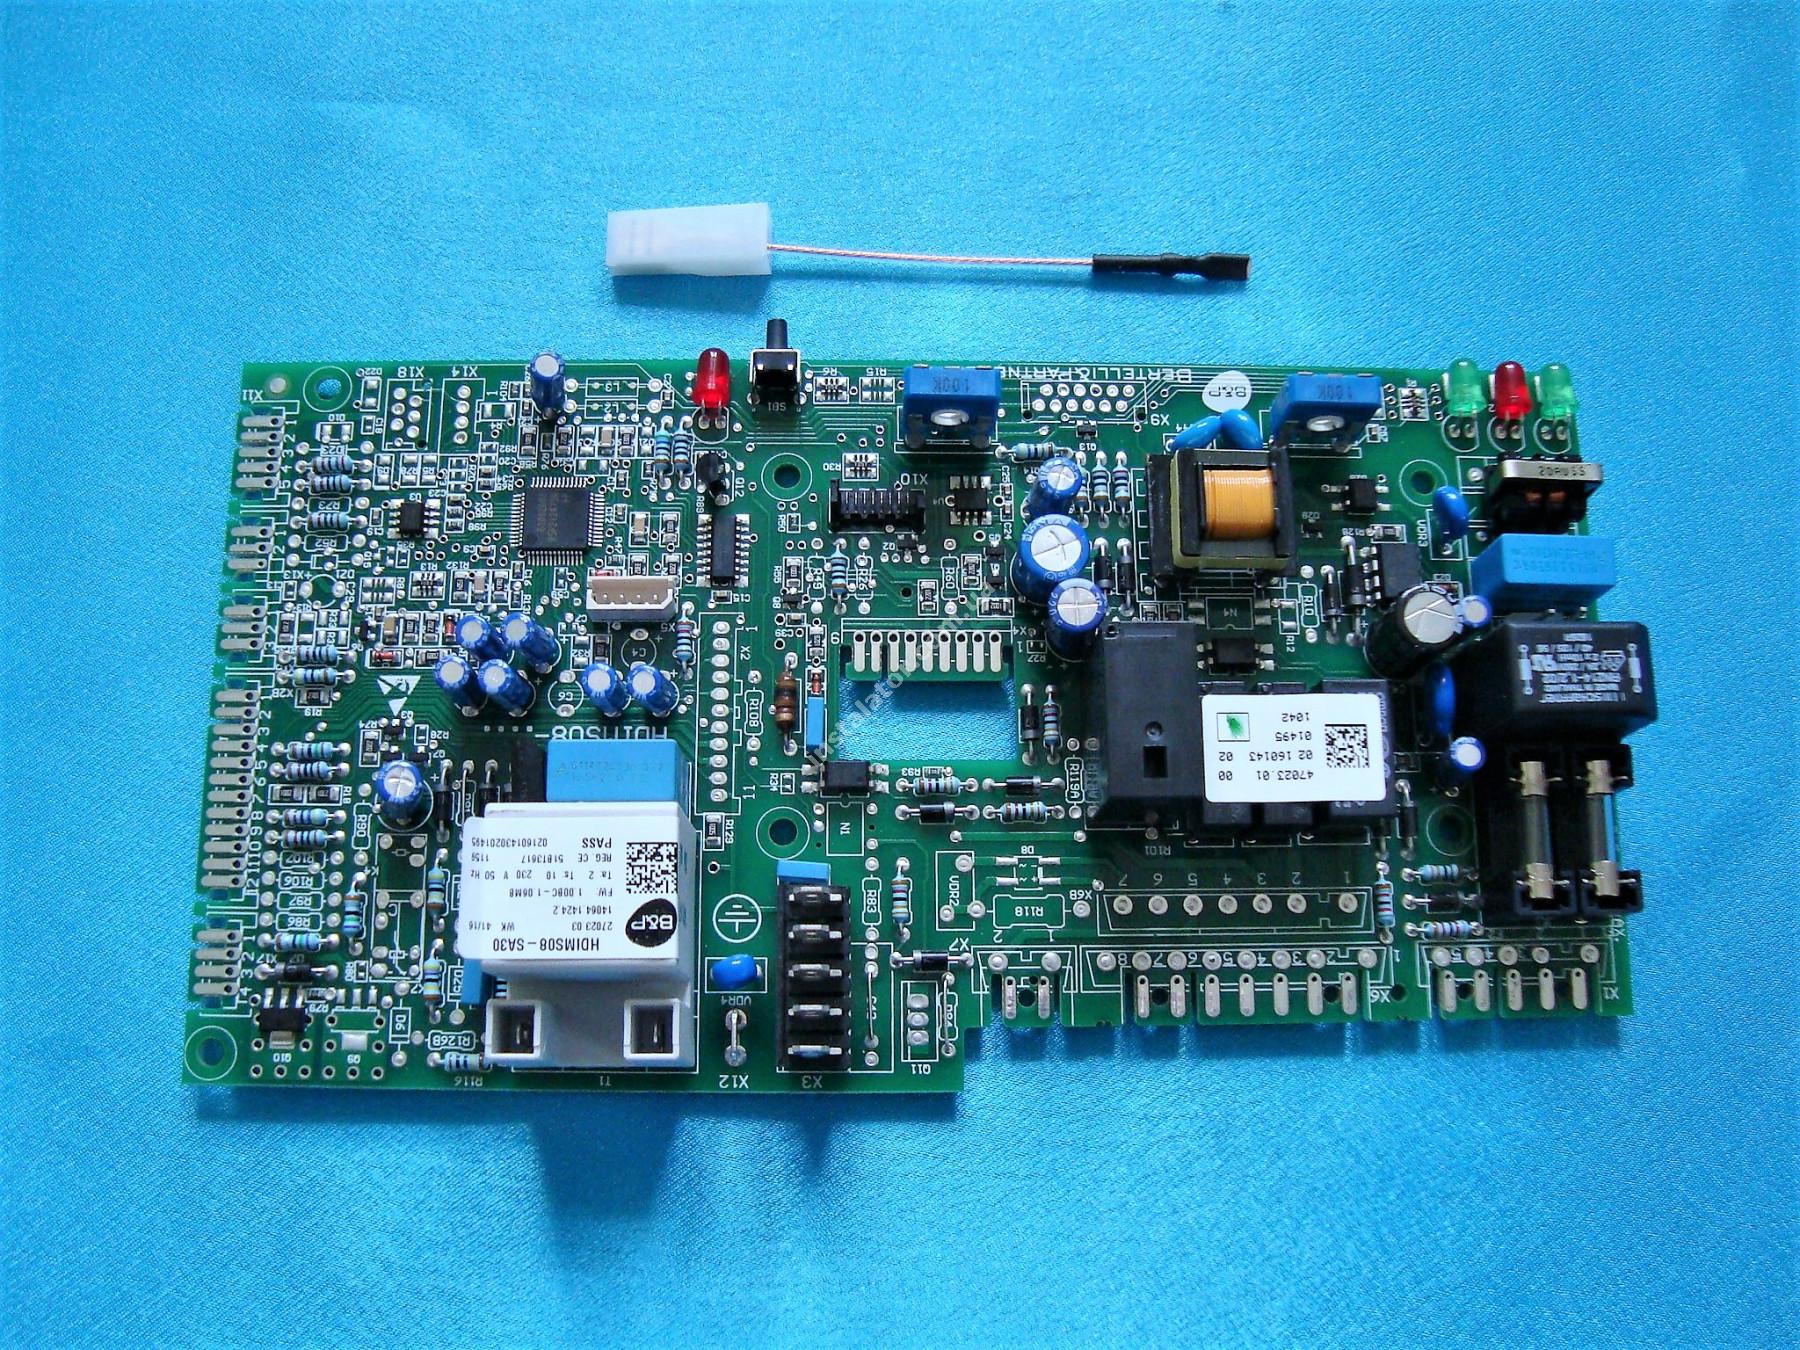 BI2075105 Плата керування Biasi Delta M97R full-image-0